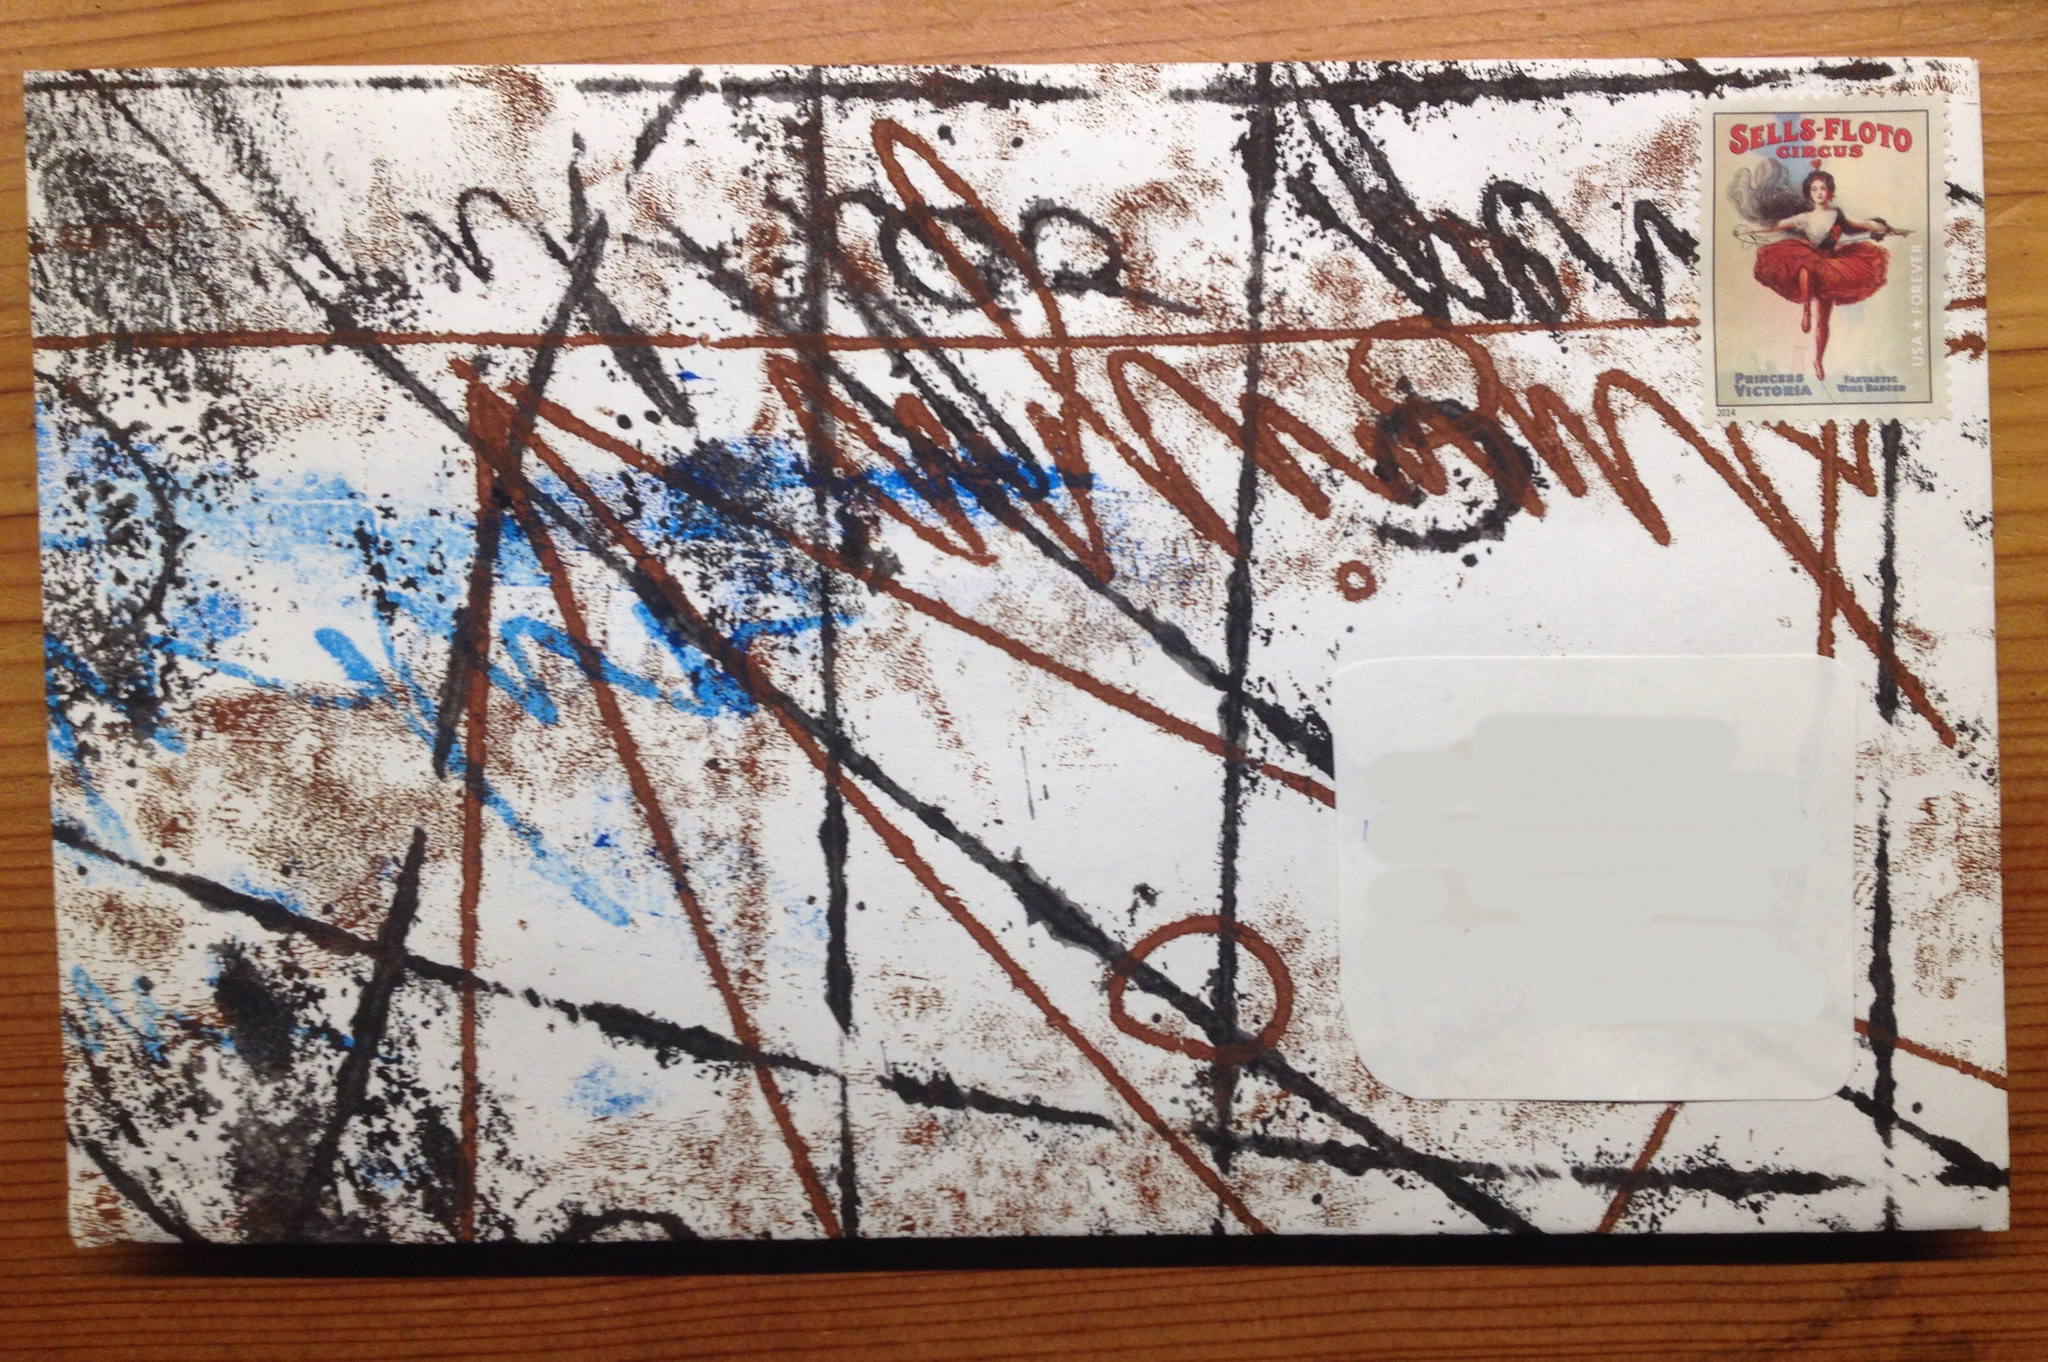 Decorated Envelope by Tim Ereneta.